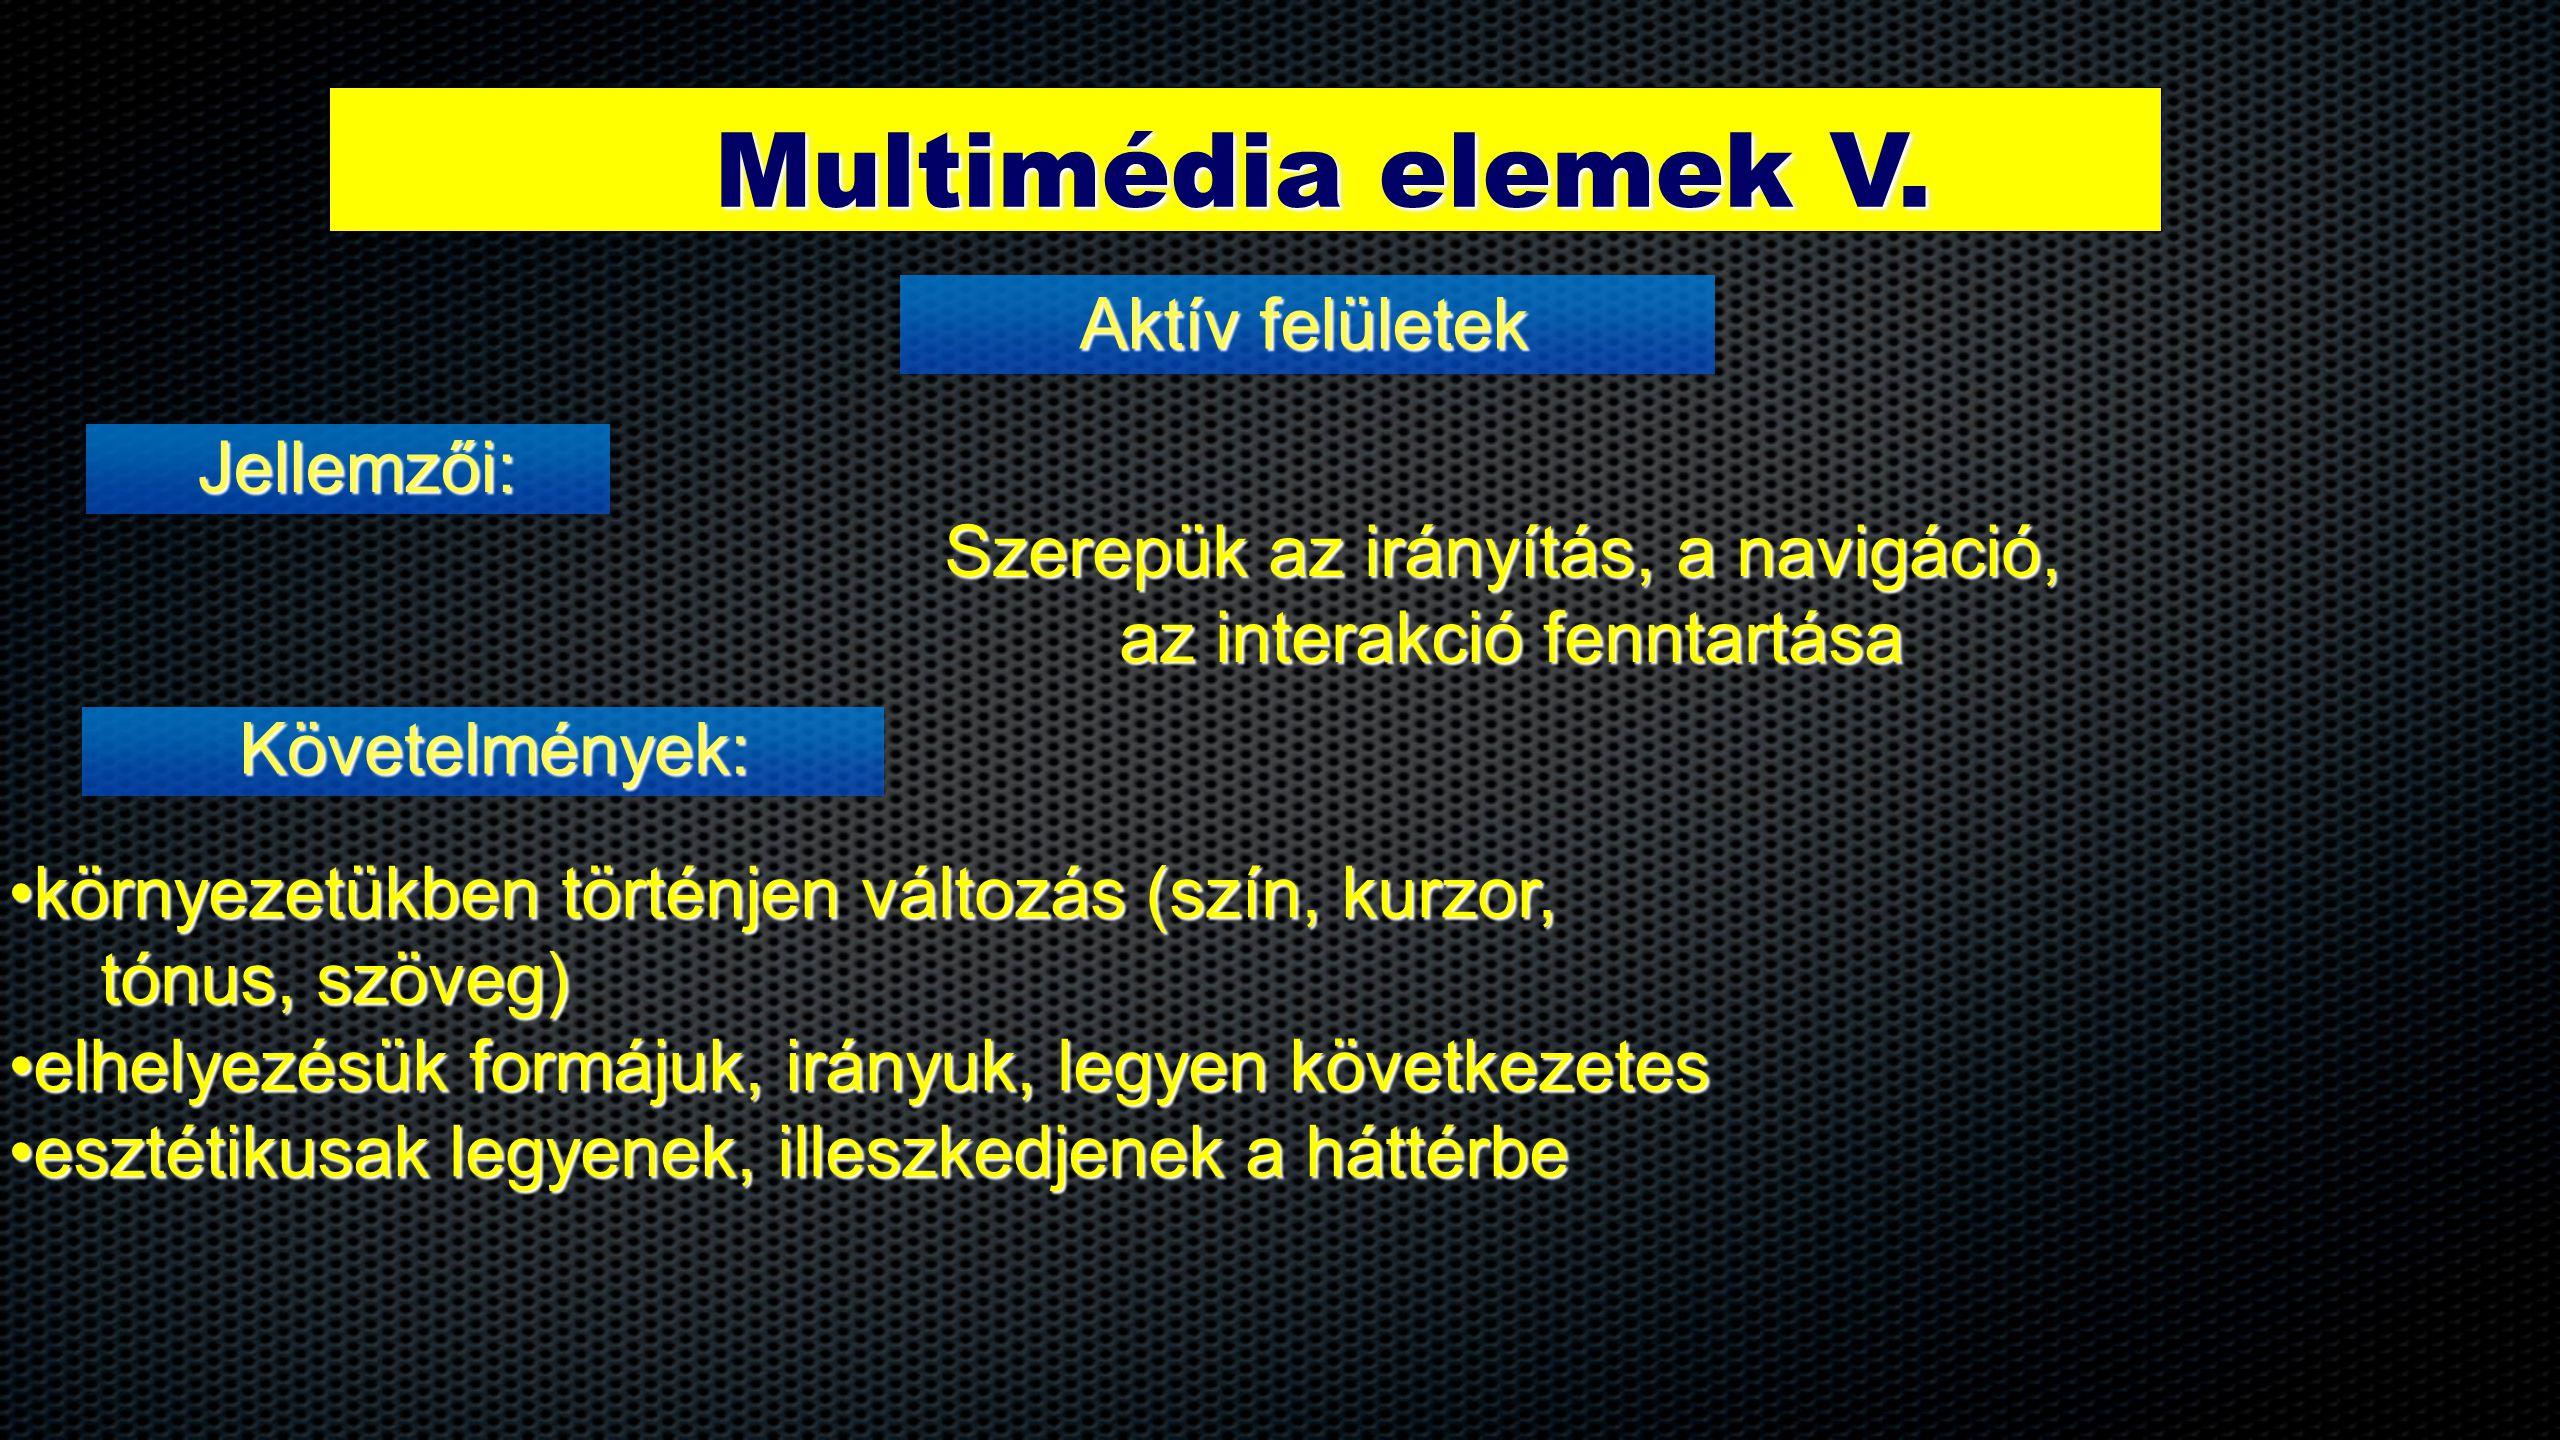 Multimédia elemek V.